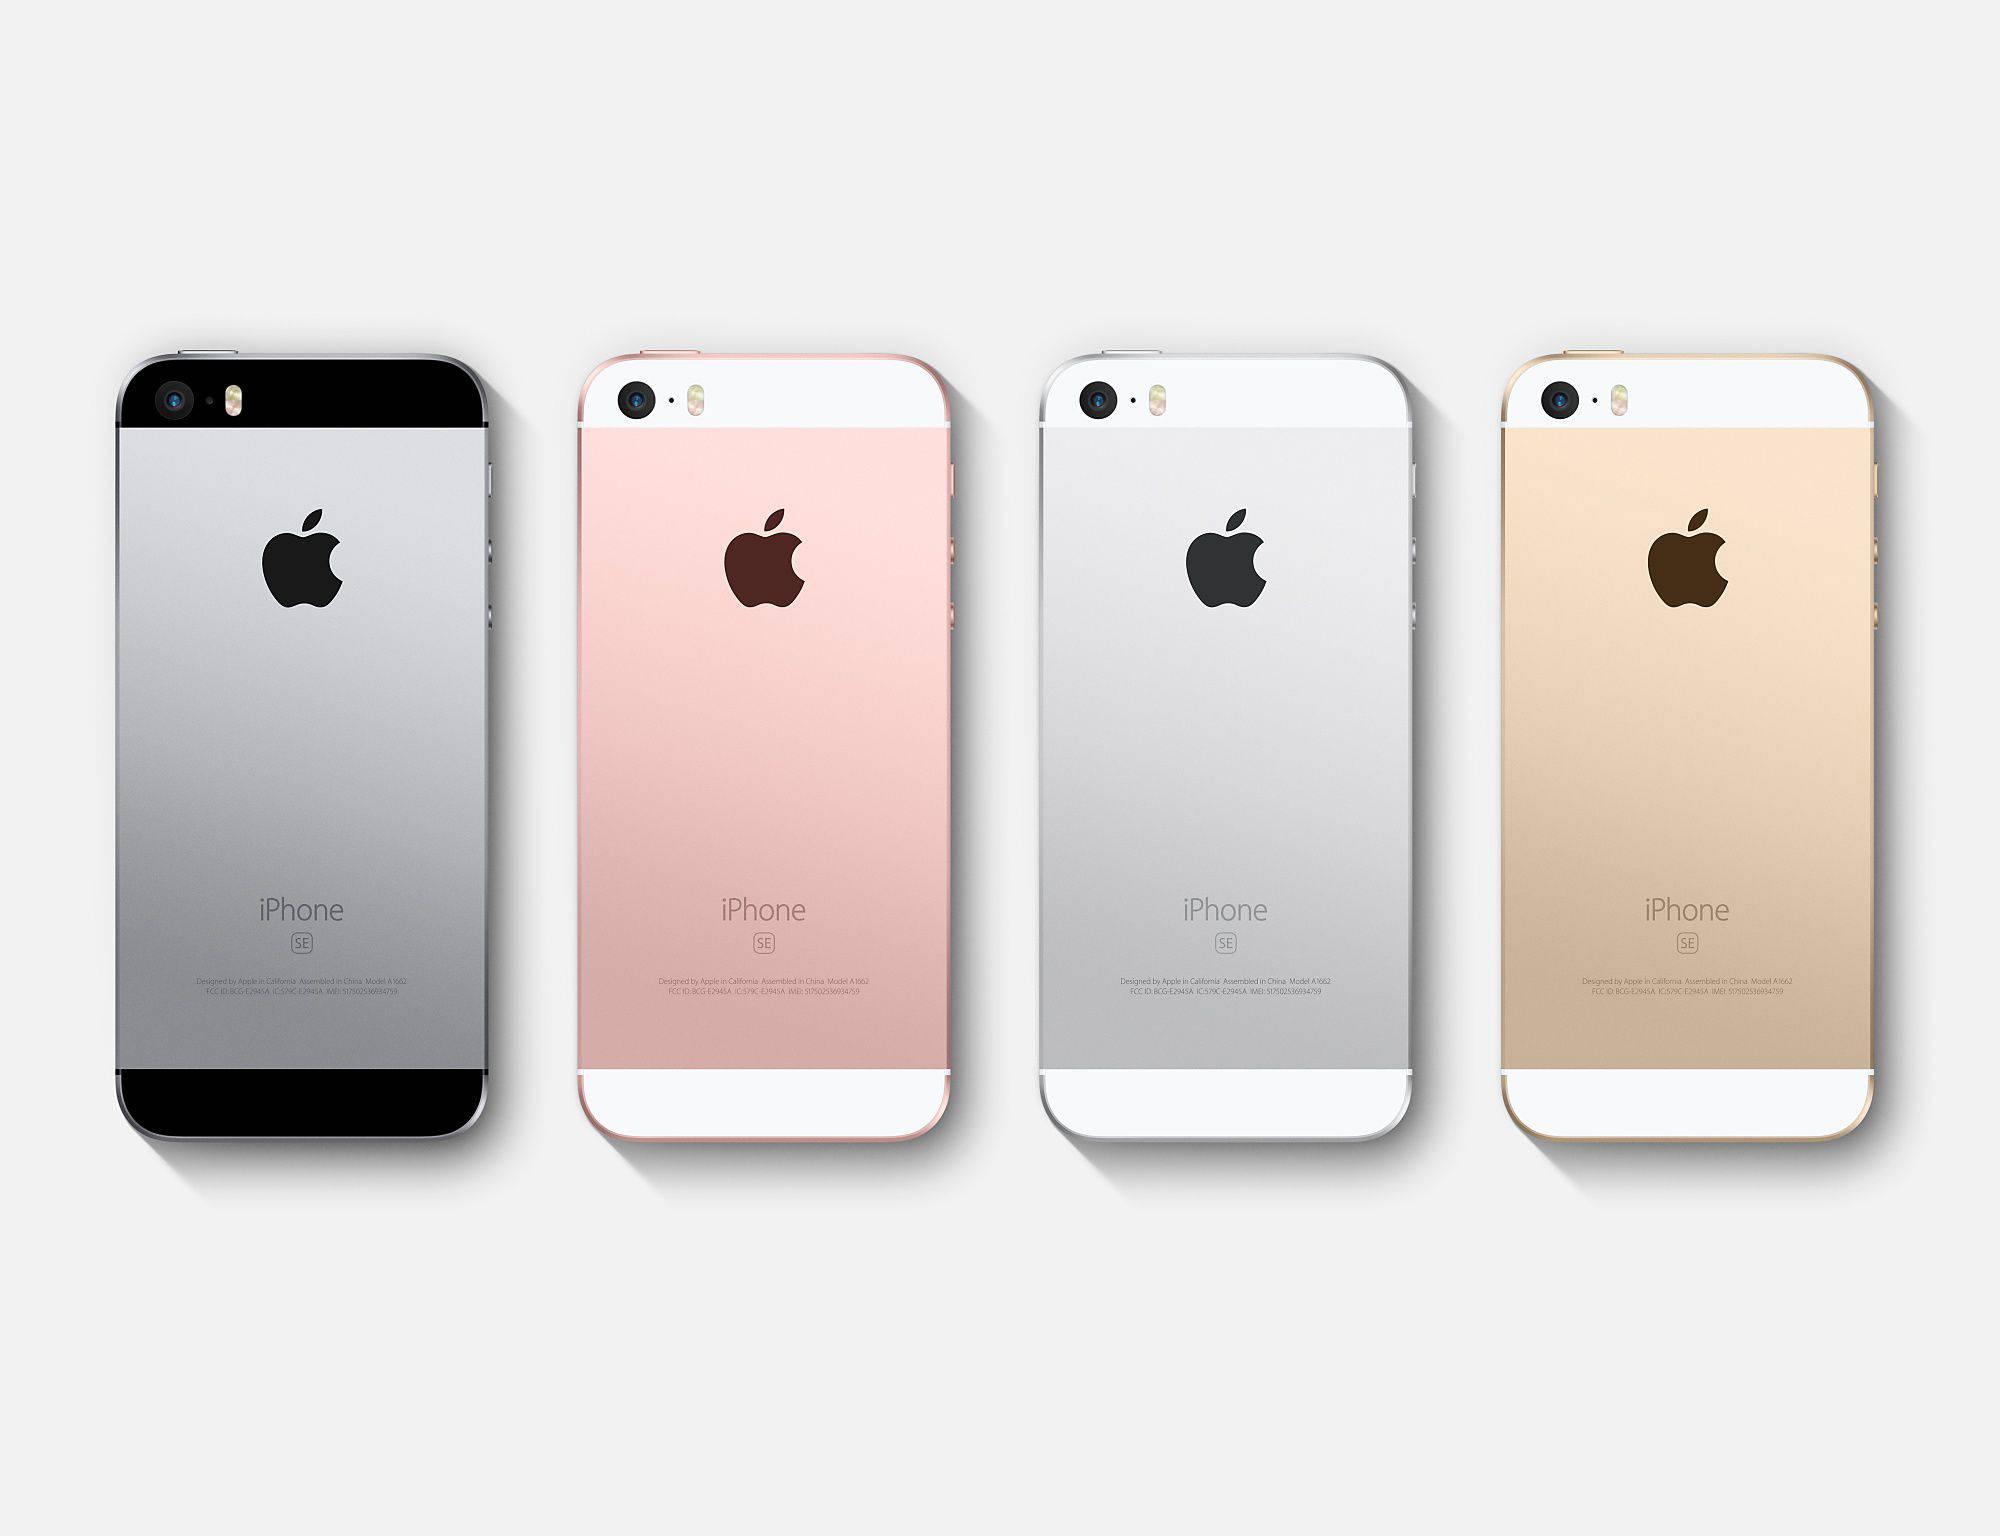 iPhone-se PingWest